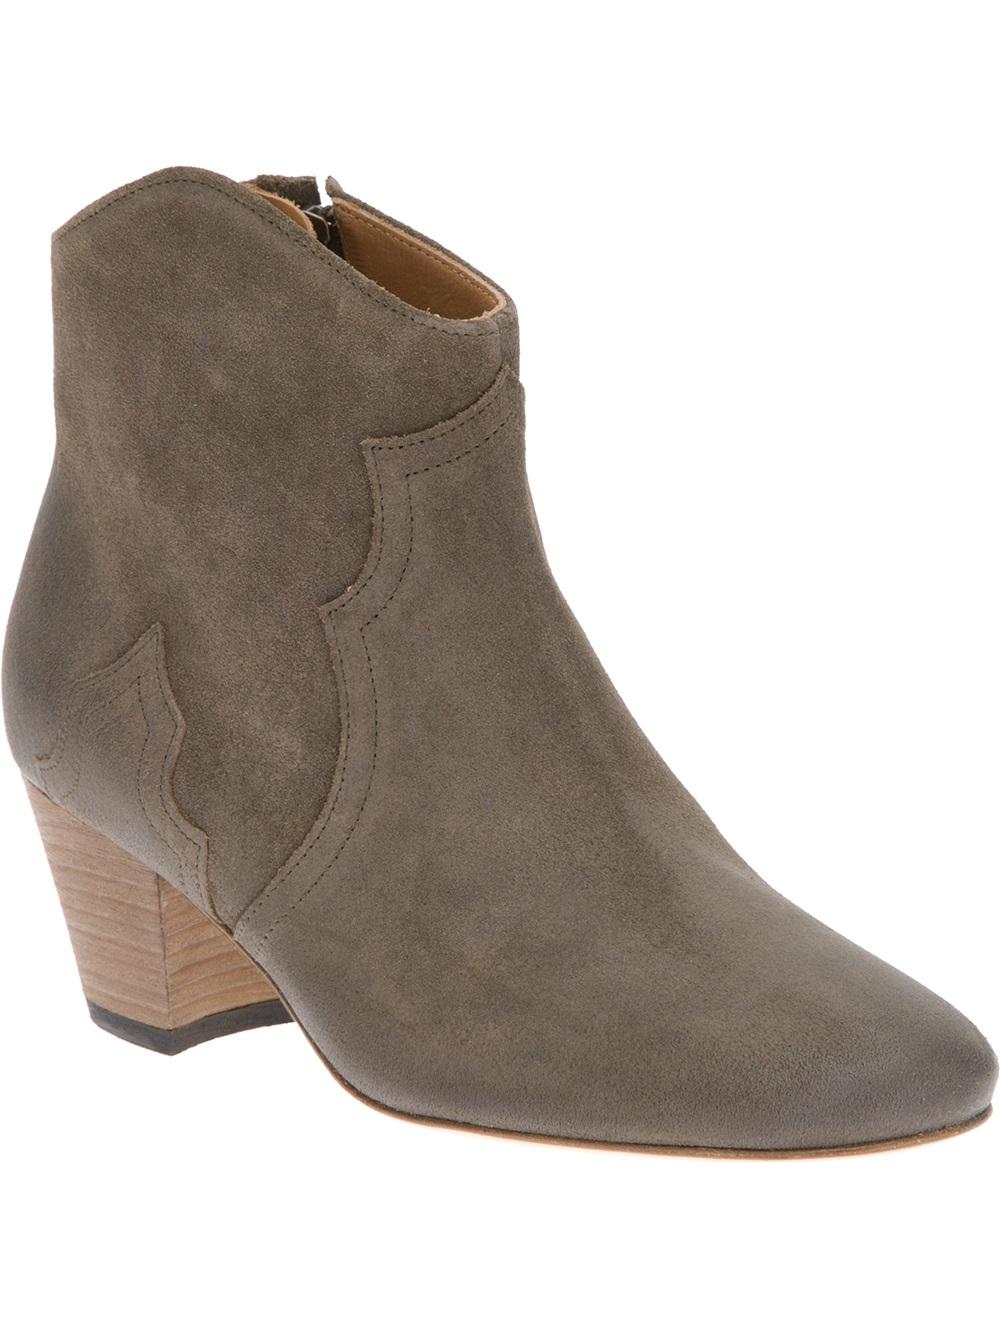 isabel marant dicker ankle boot in beige bronze lyst. Black Bedroom Furniture Sets. Home Design Ideas